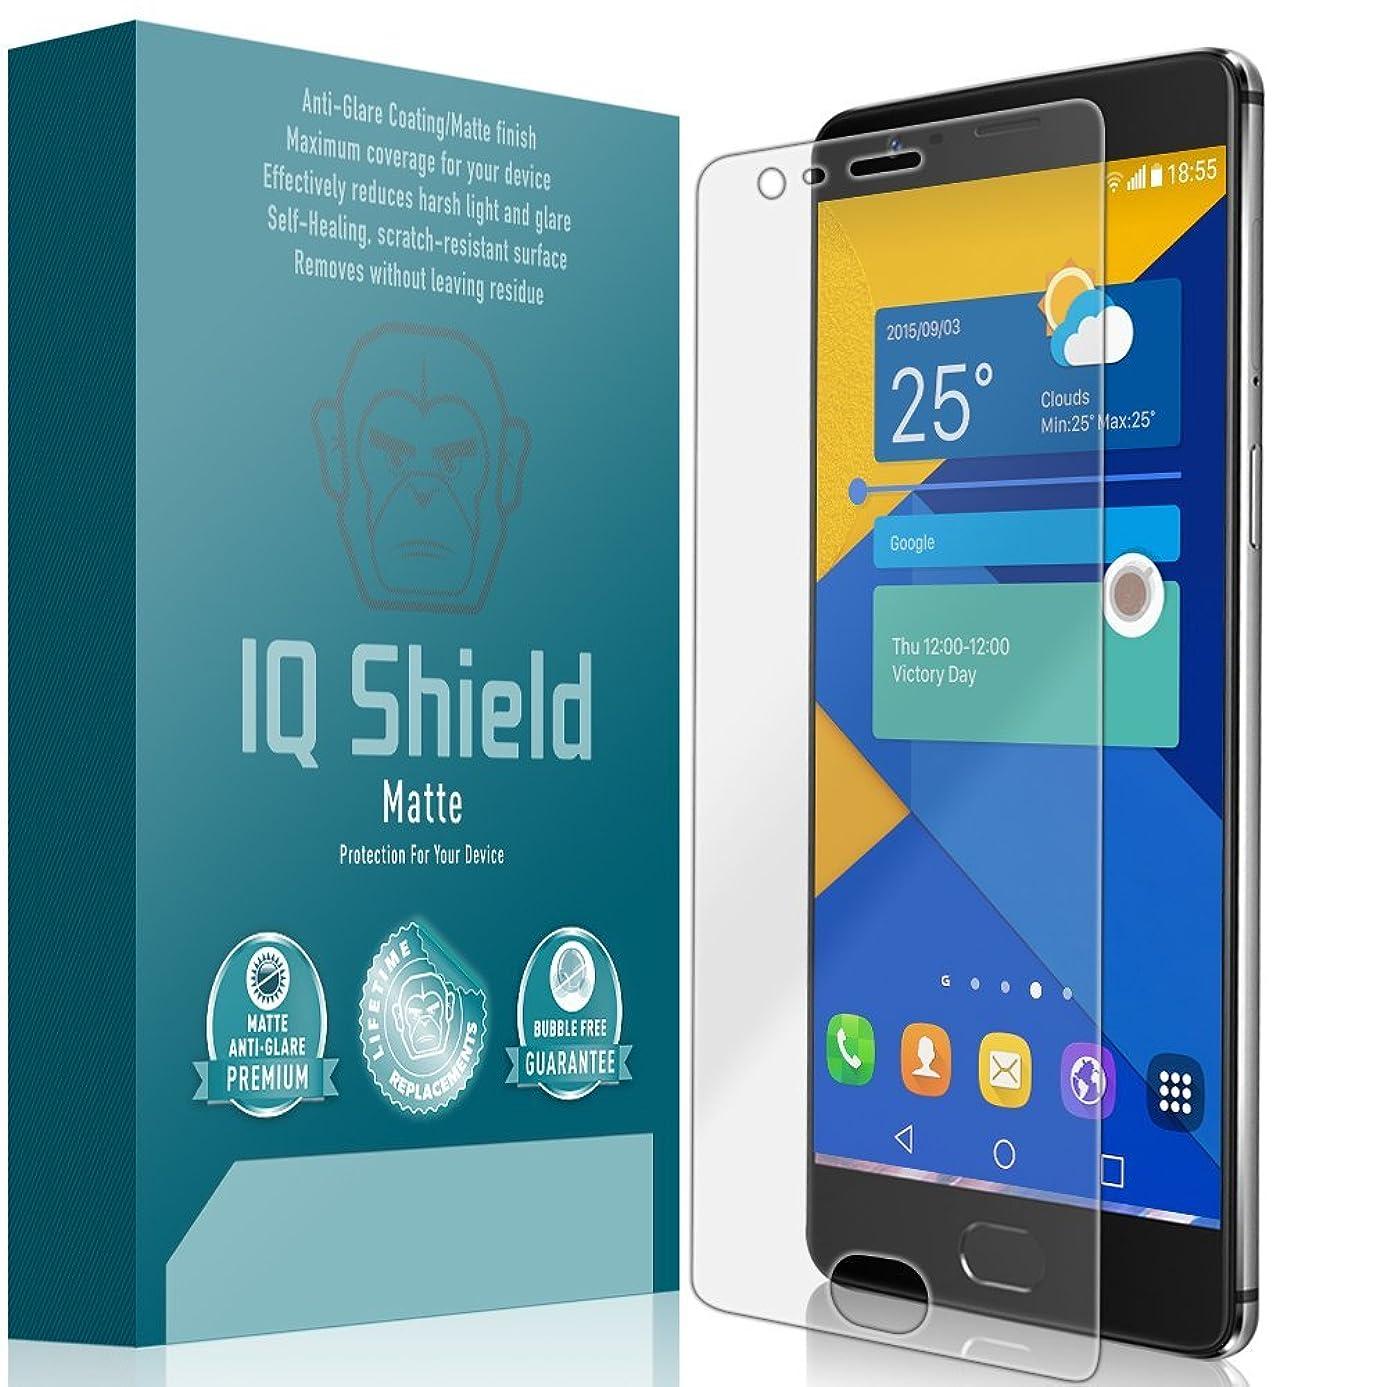 OnePlus 3 Screen Protector, IQ Shield Matte Full Coverage Anti-Glare Screen Protector for One Plus 3 Bubble-Free Film